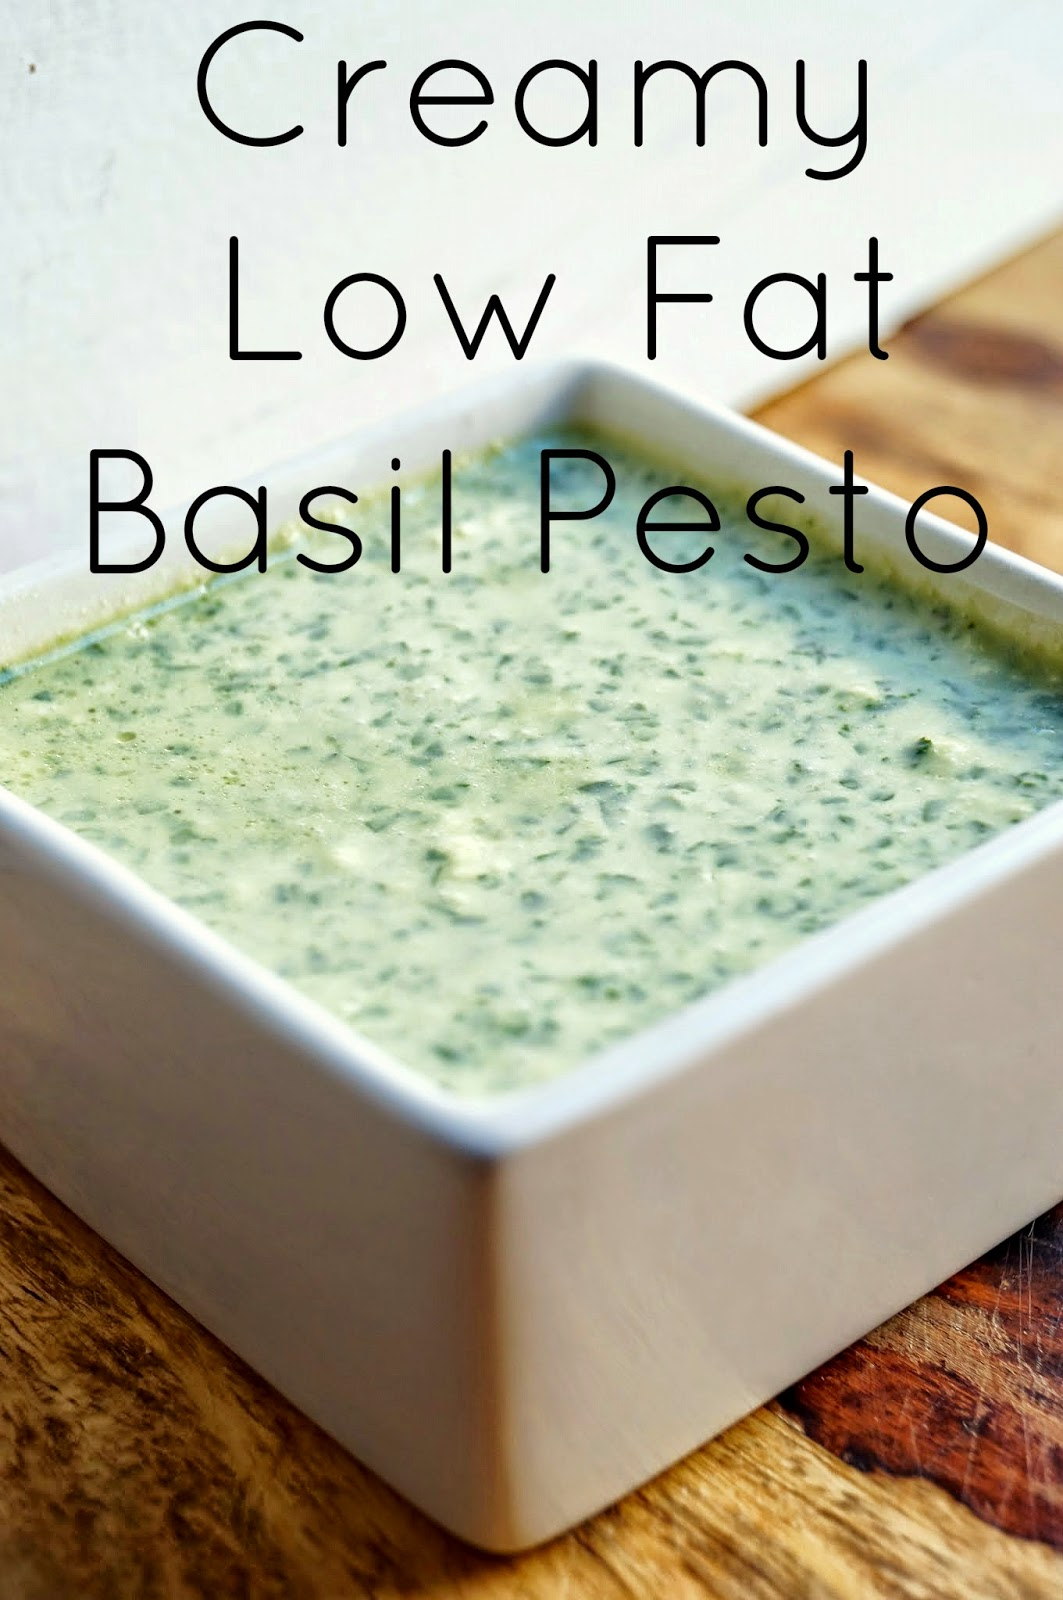 Creamy Low Fat Basil Pesto